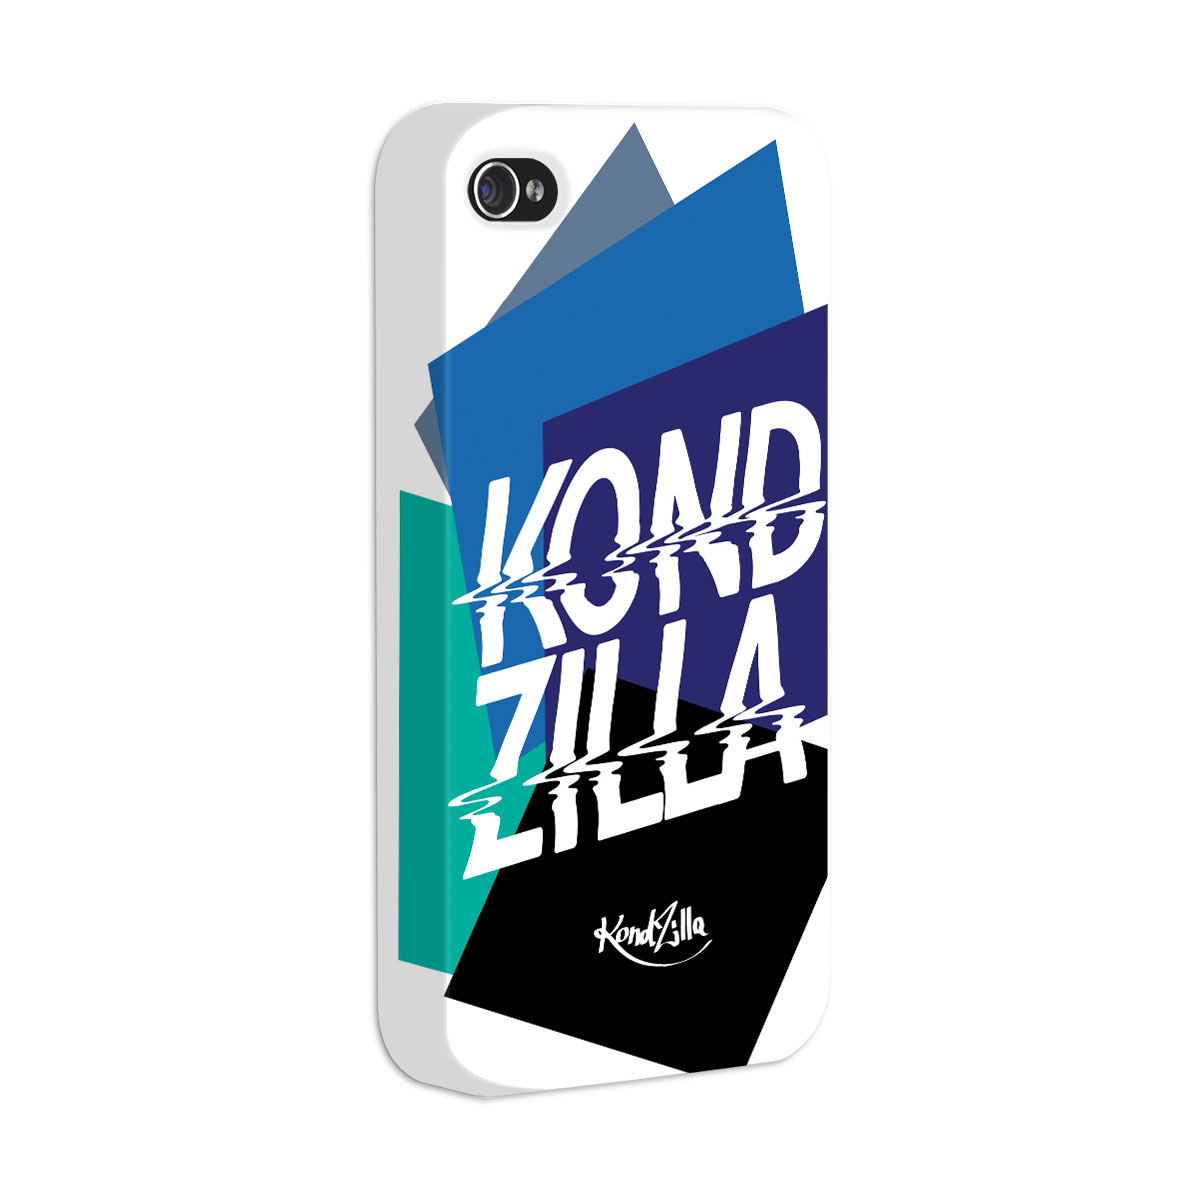 Capa para iPhone 4/4S Kondzilla Stripe Art